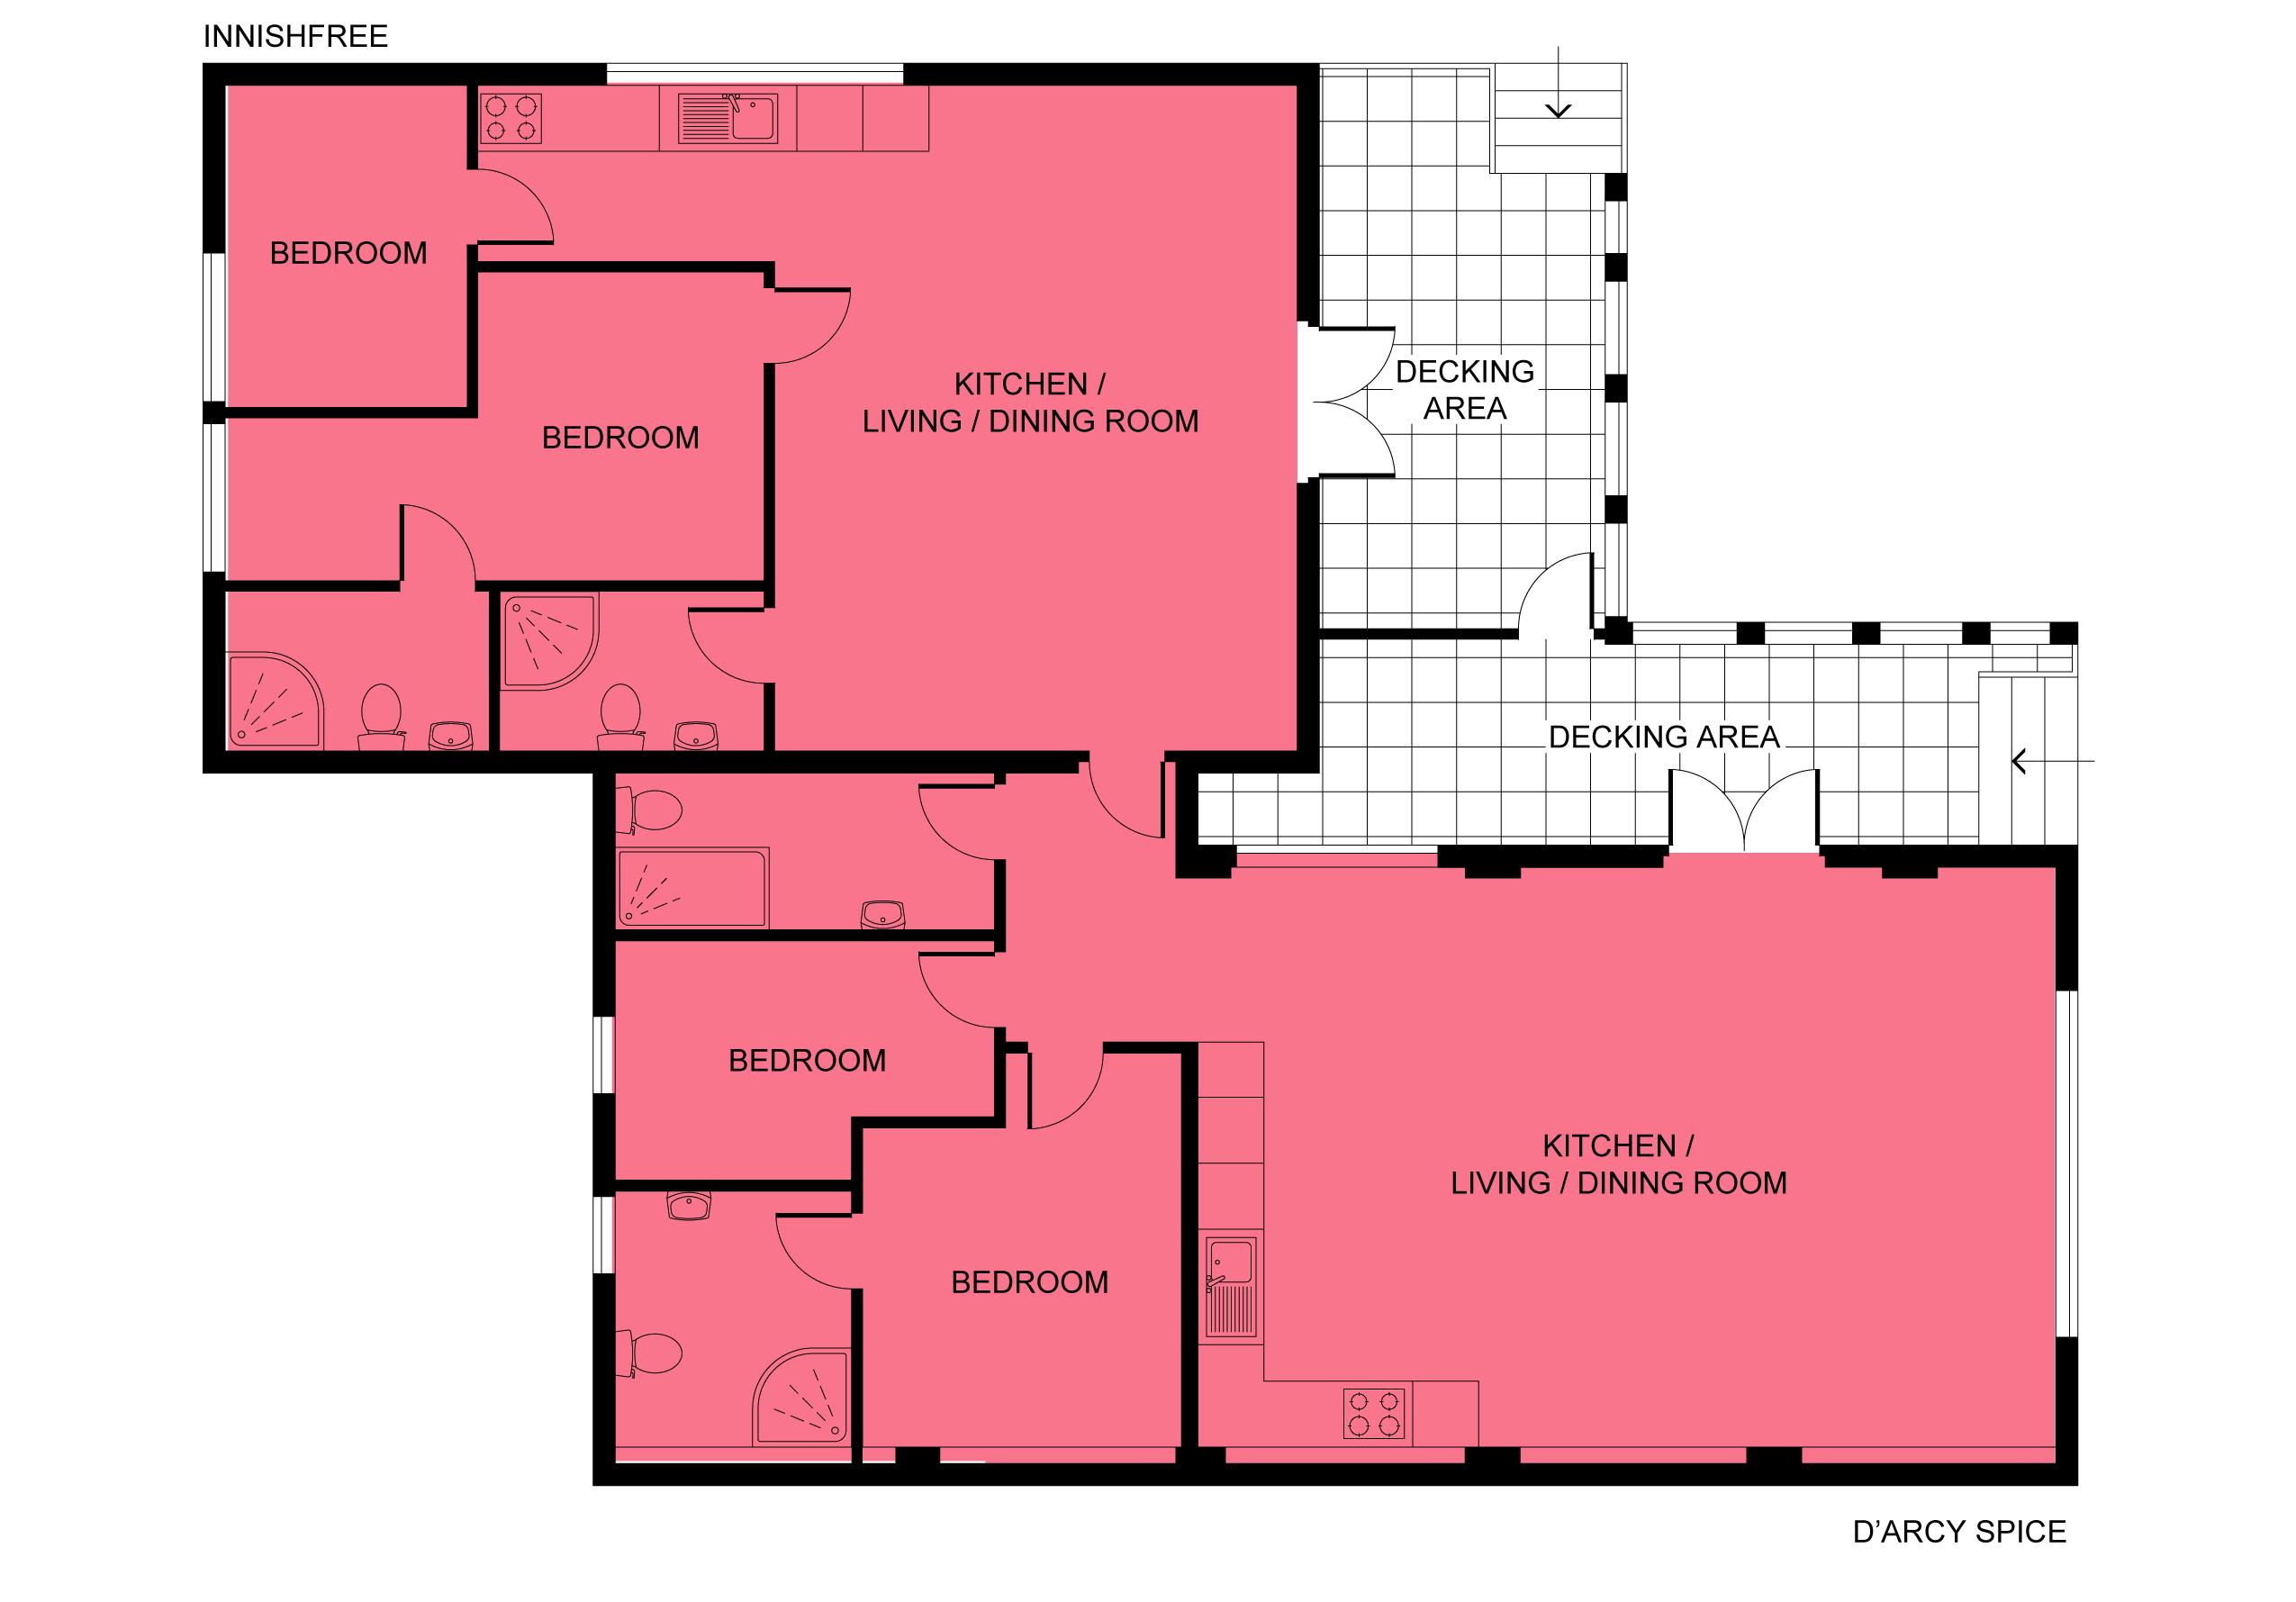 Floor plan - Innishfree